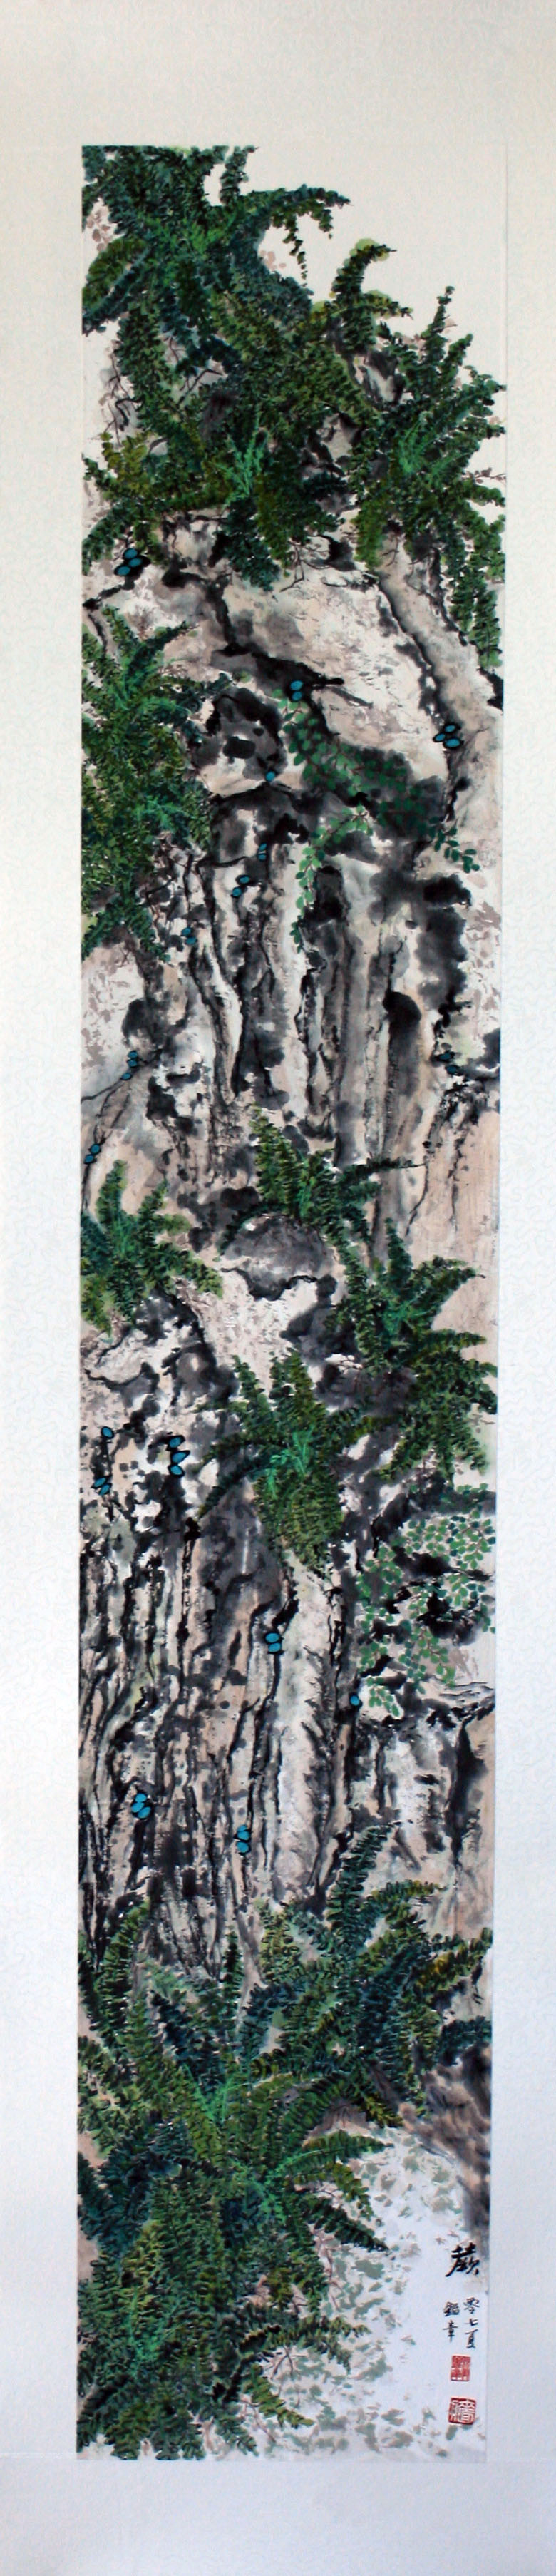 蕨 Ferns